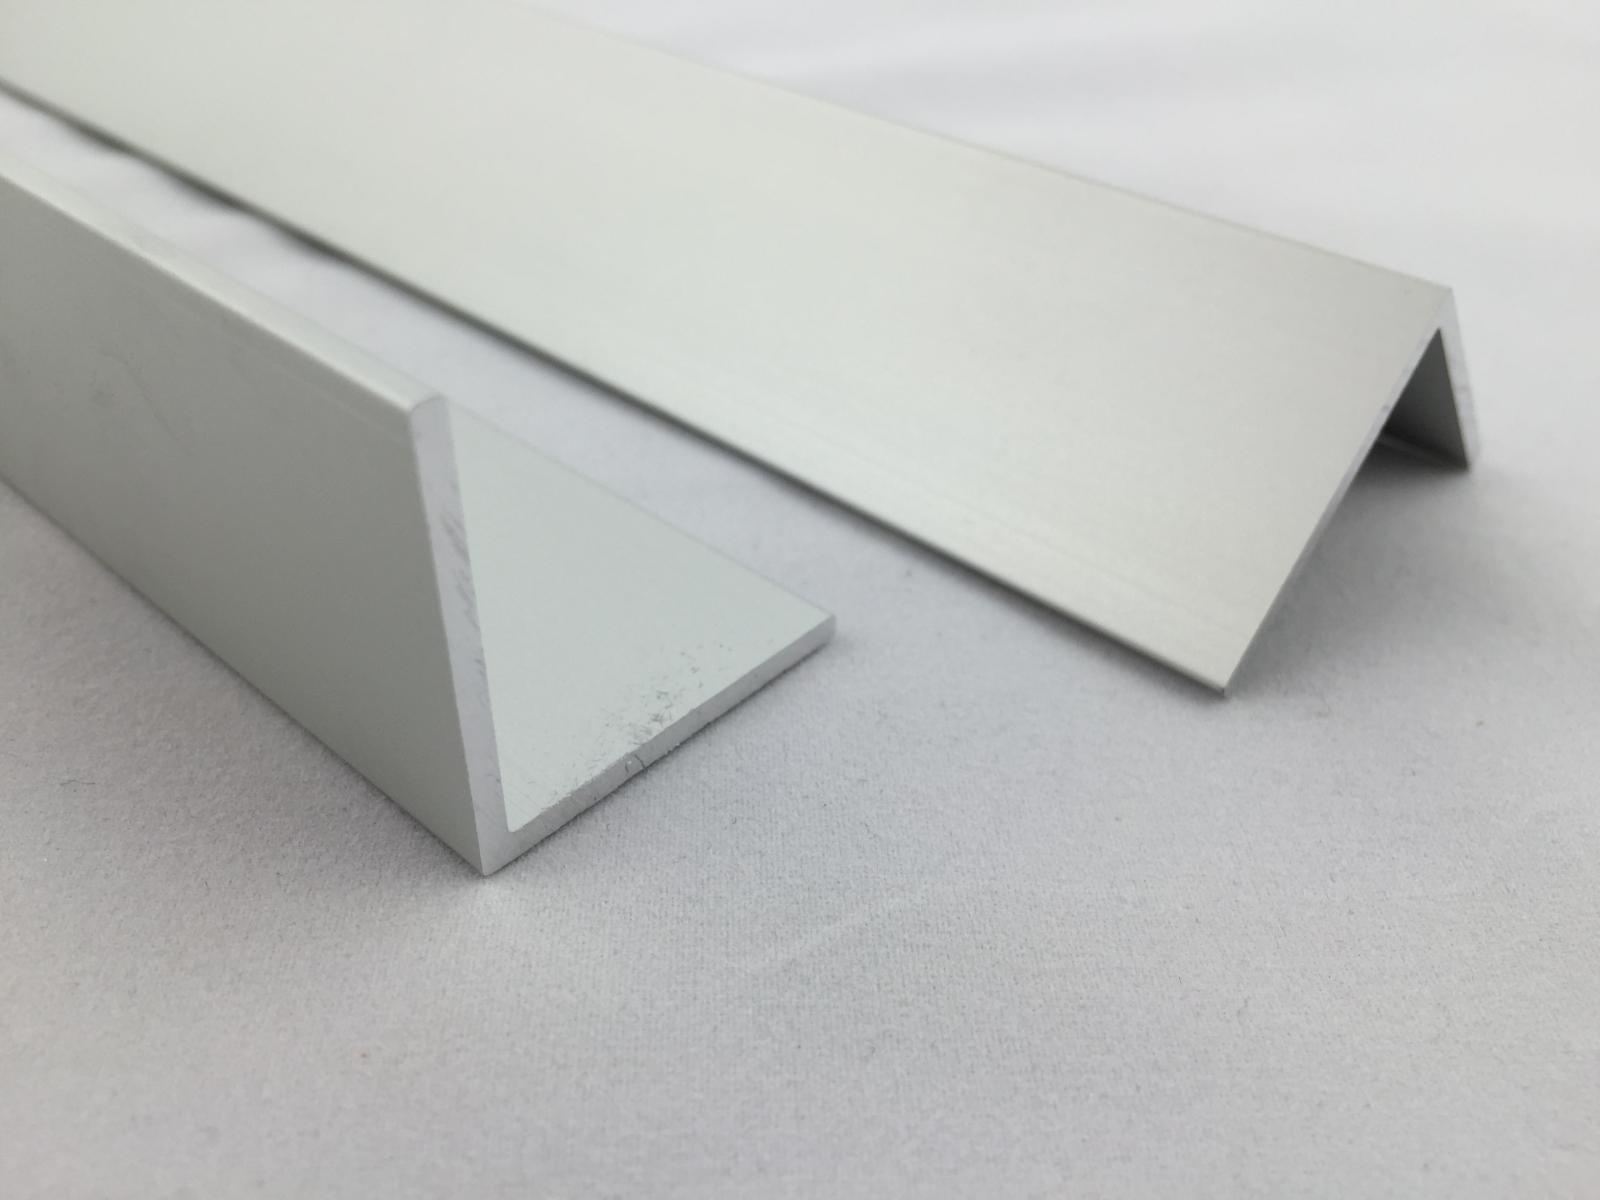 aluminium winkel profil eloxiert ebay. Black Bedroom Furniture Sets. Home Design Ideas